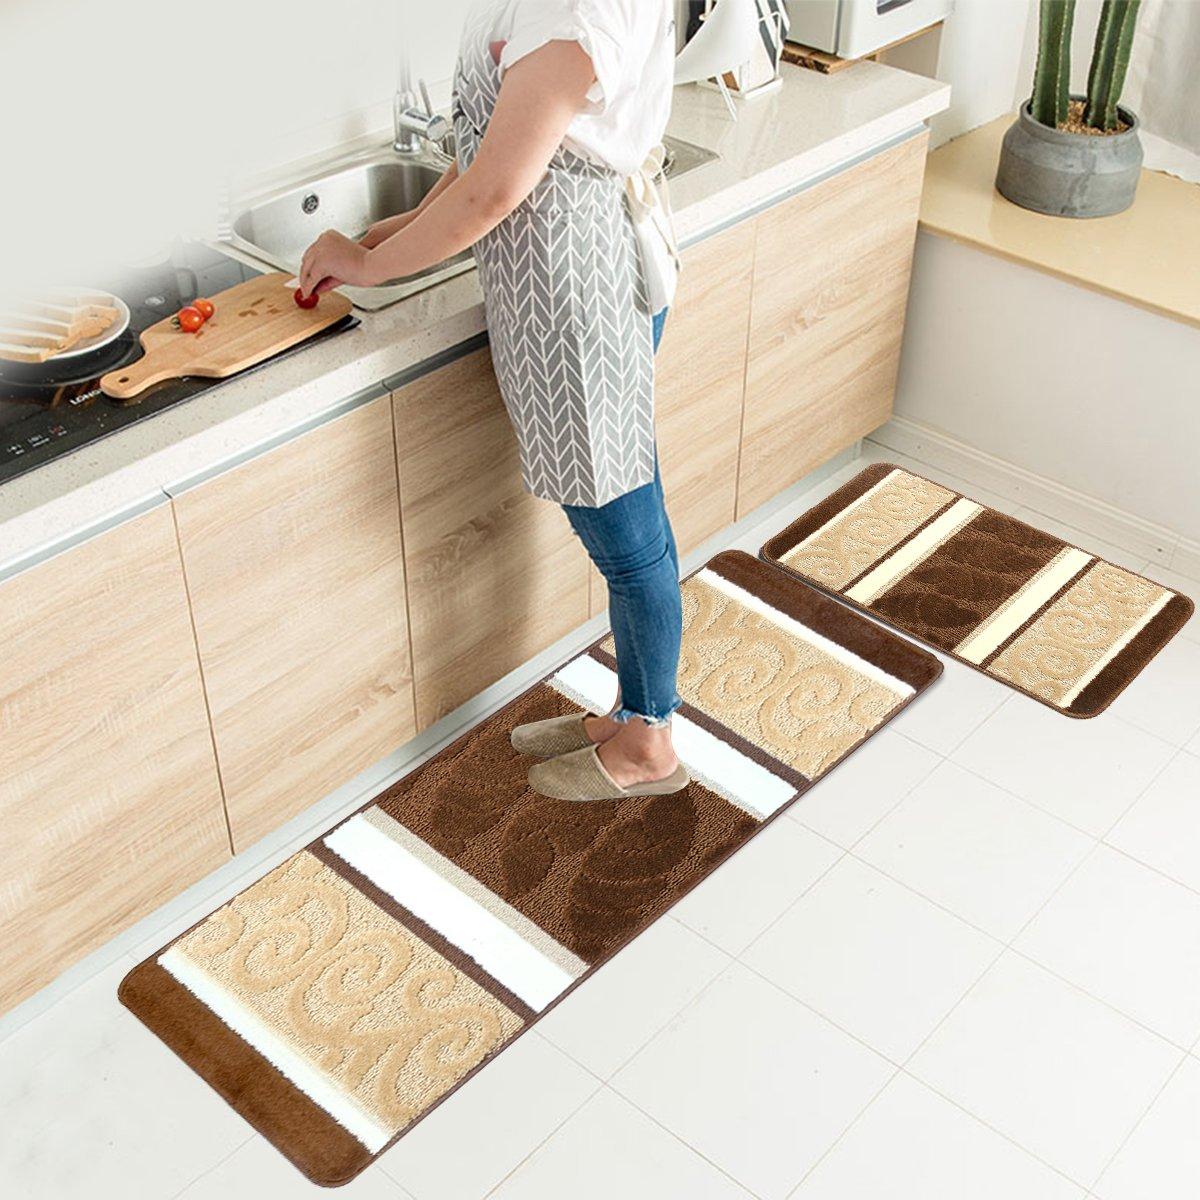 "HEBE Kitchen Rugs Set 2 Piece Machine Washable Non-Slip Kitchen Mats and Rugs Runner Set Rubber Backing Indoor Outdoor Entry Floor Carpet Door Mat Runner (18""x47""+18""x30"", Brown)"